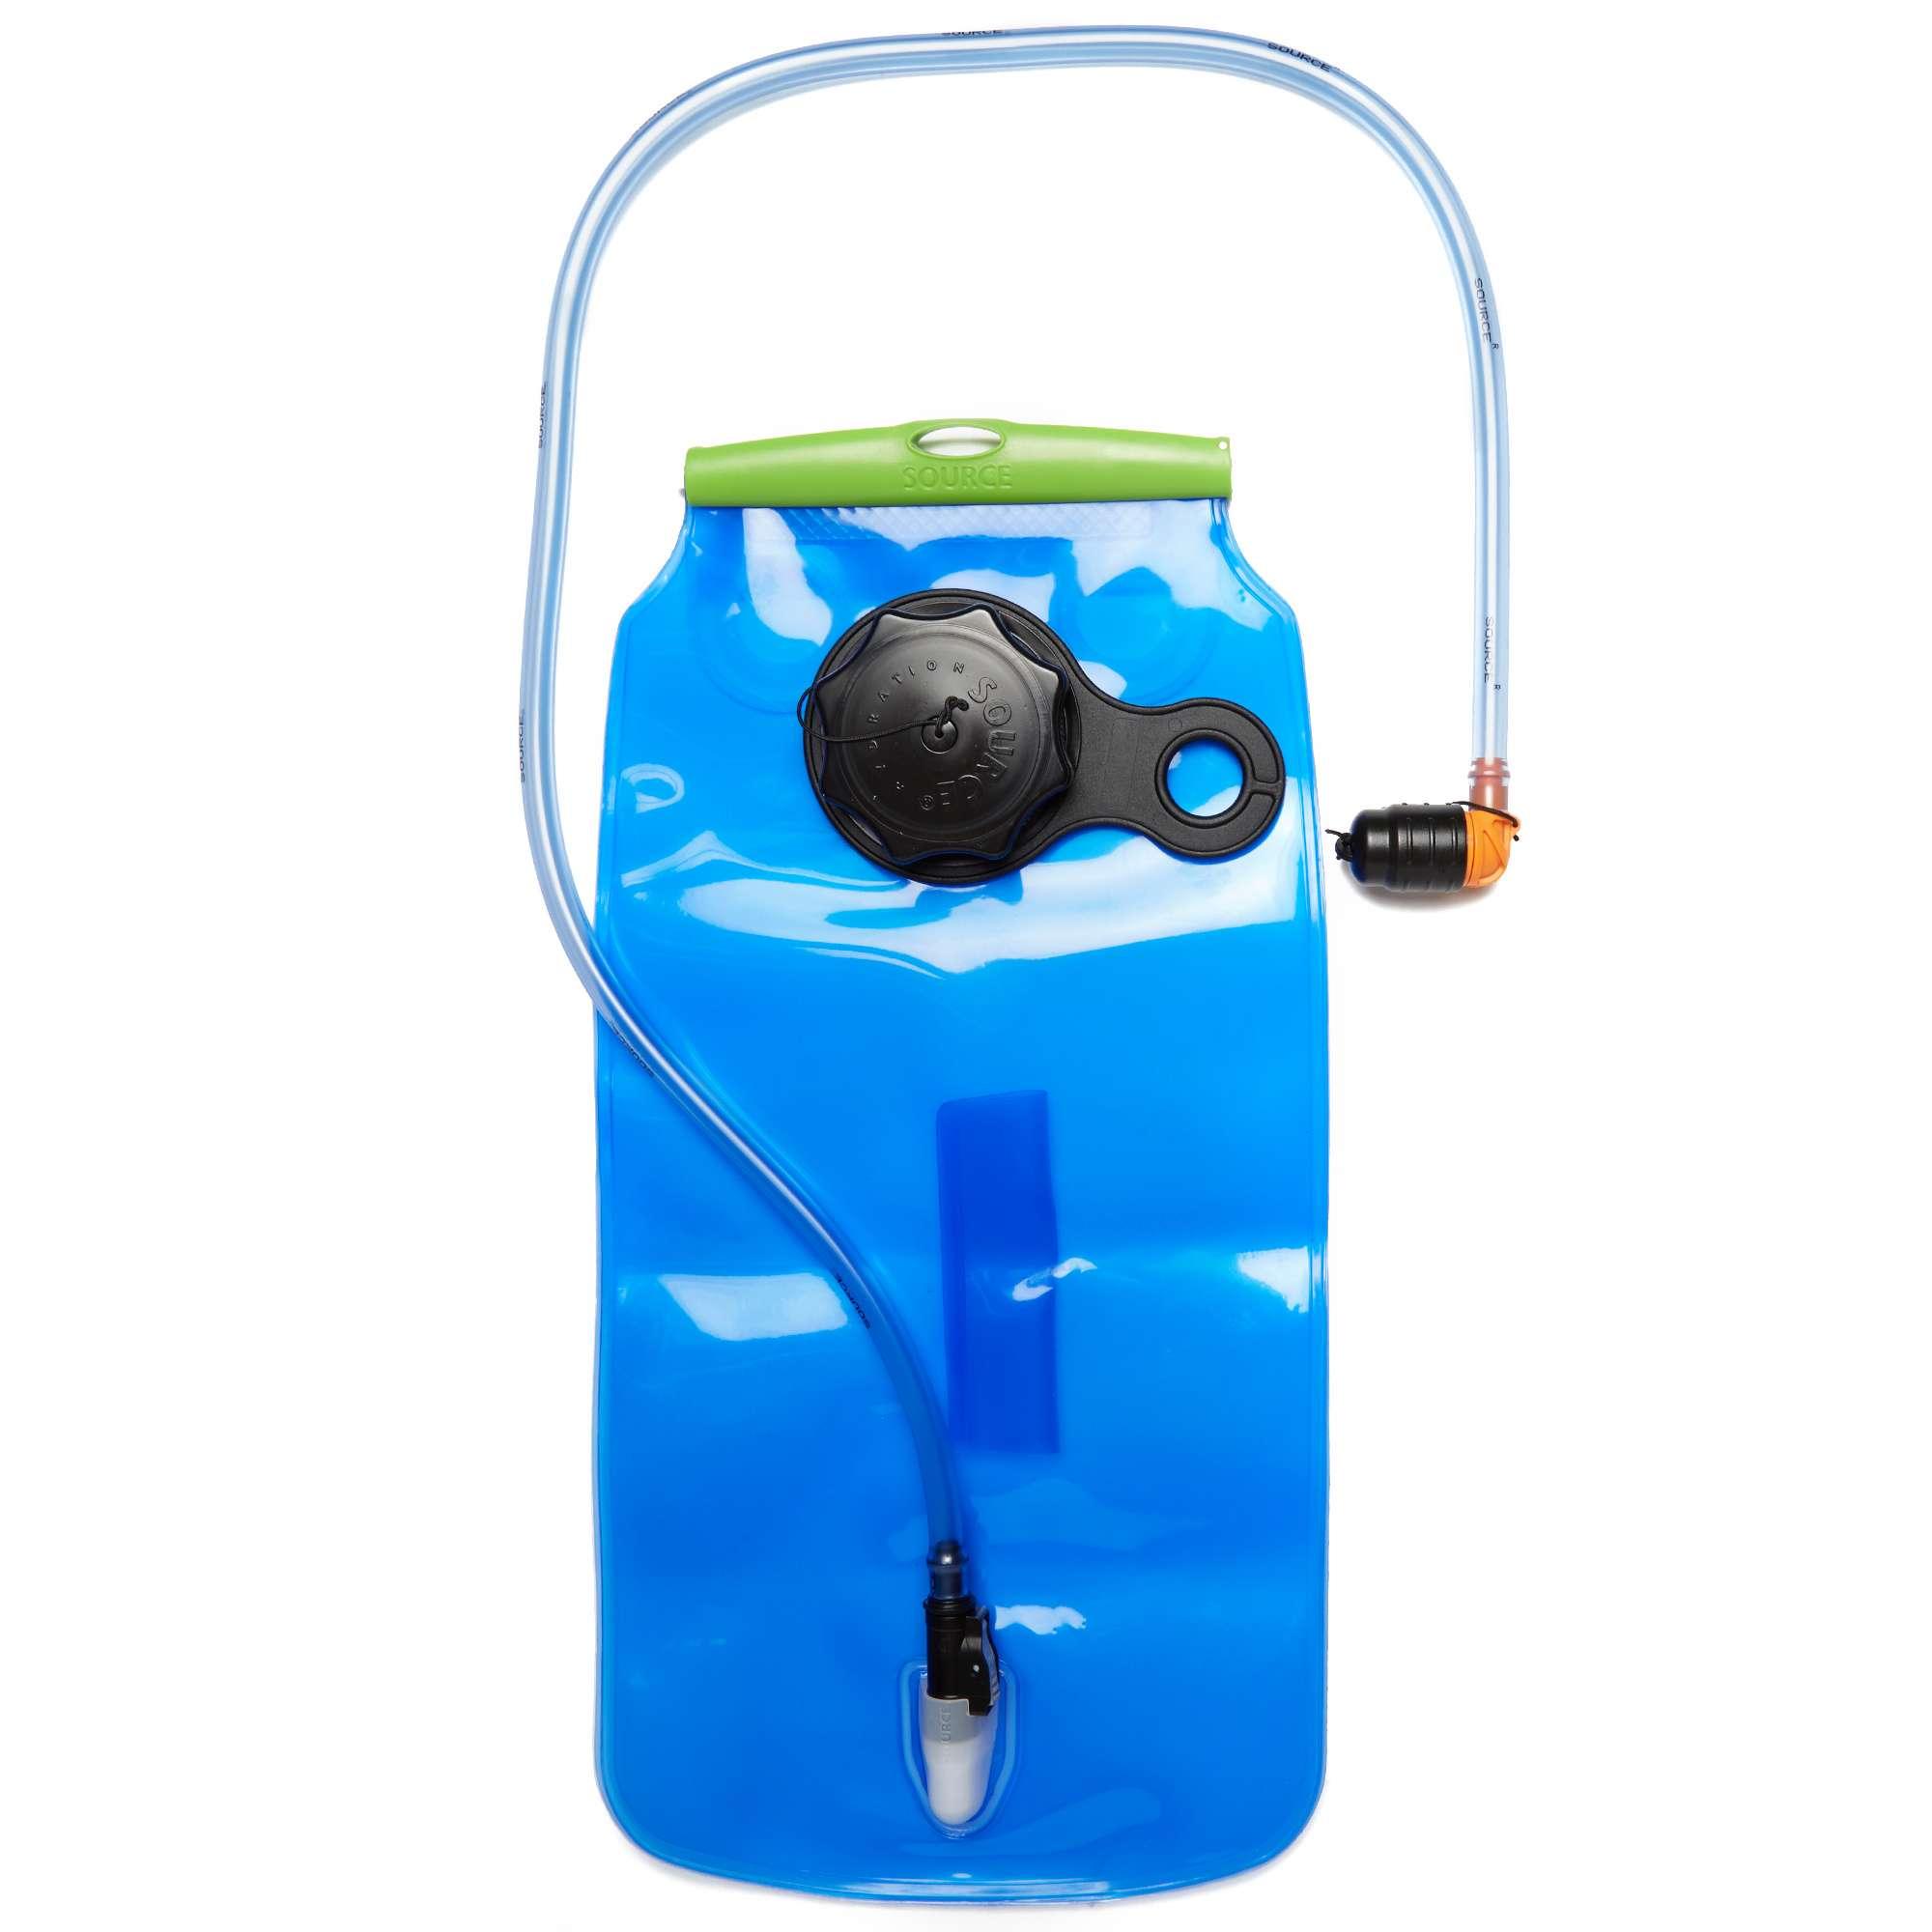 SOURCE WXP Low Profile 3L Hydration System Upgrade Kit